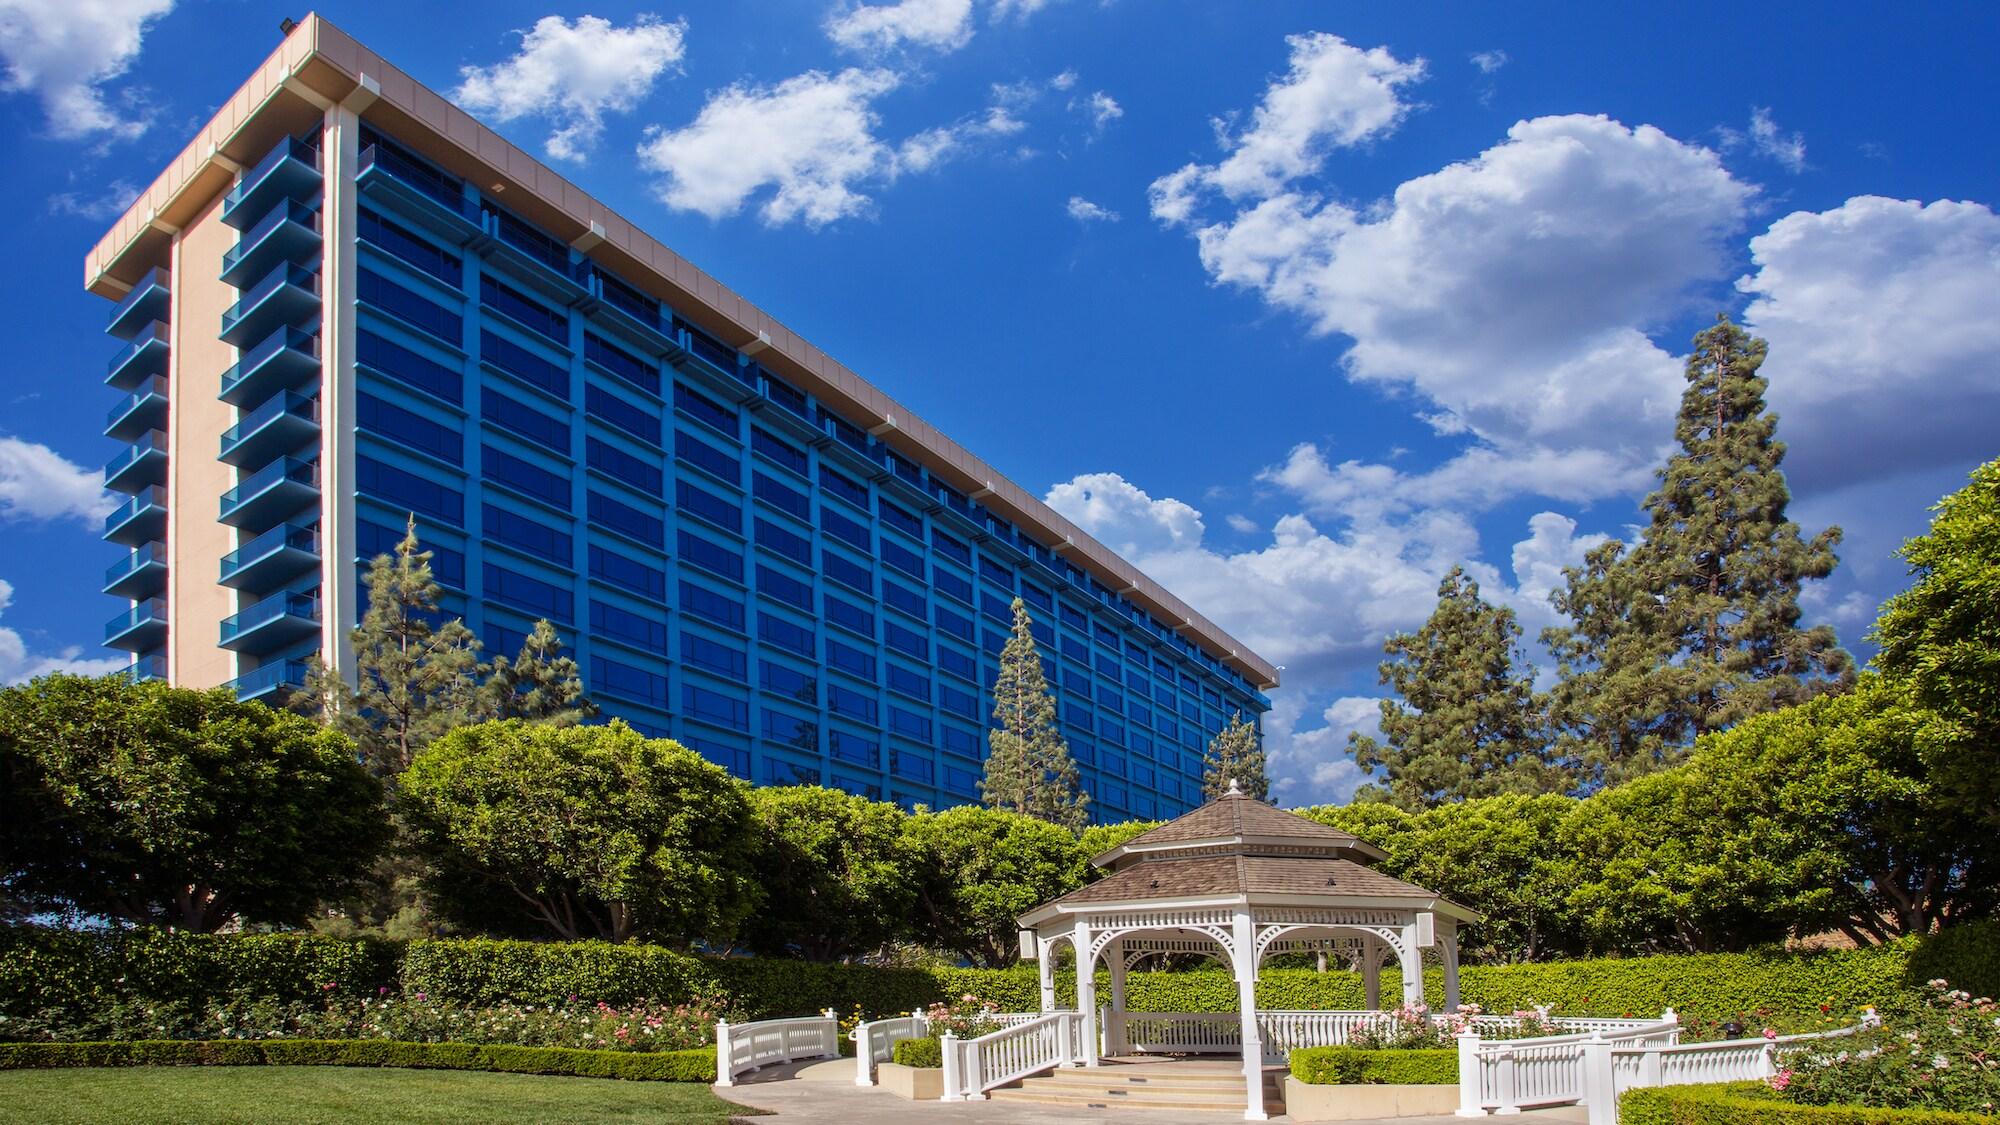 Exterior view of the Disneyland Hotel.